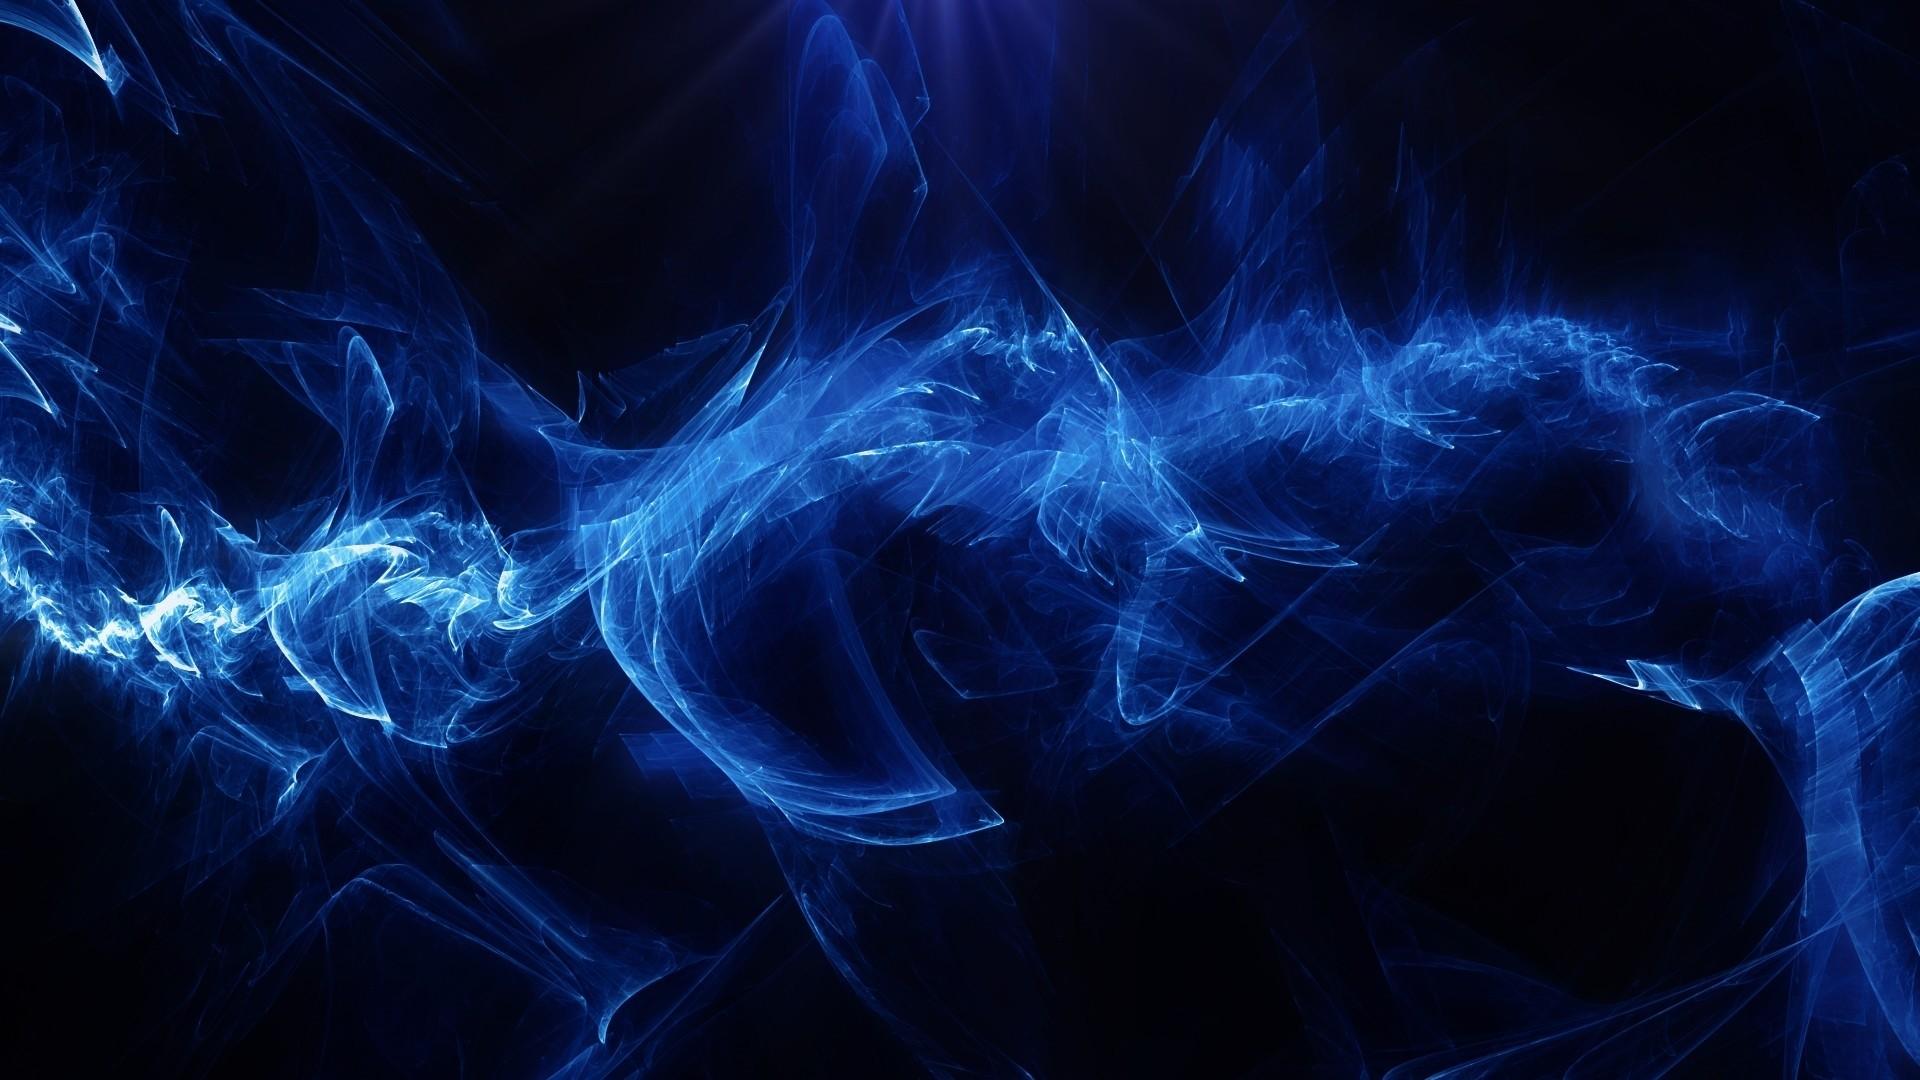 Black And Blue hd desktop wallpaper